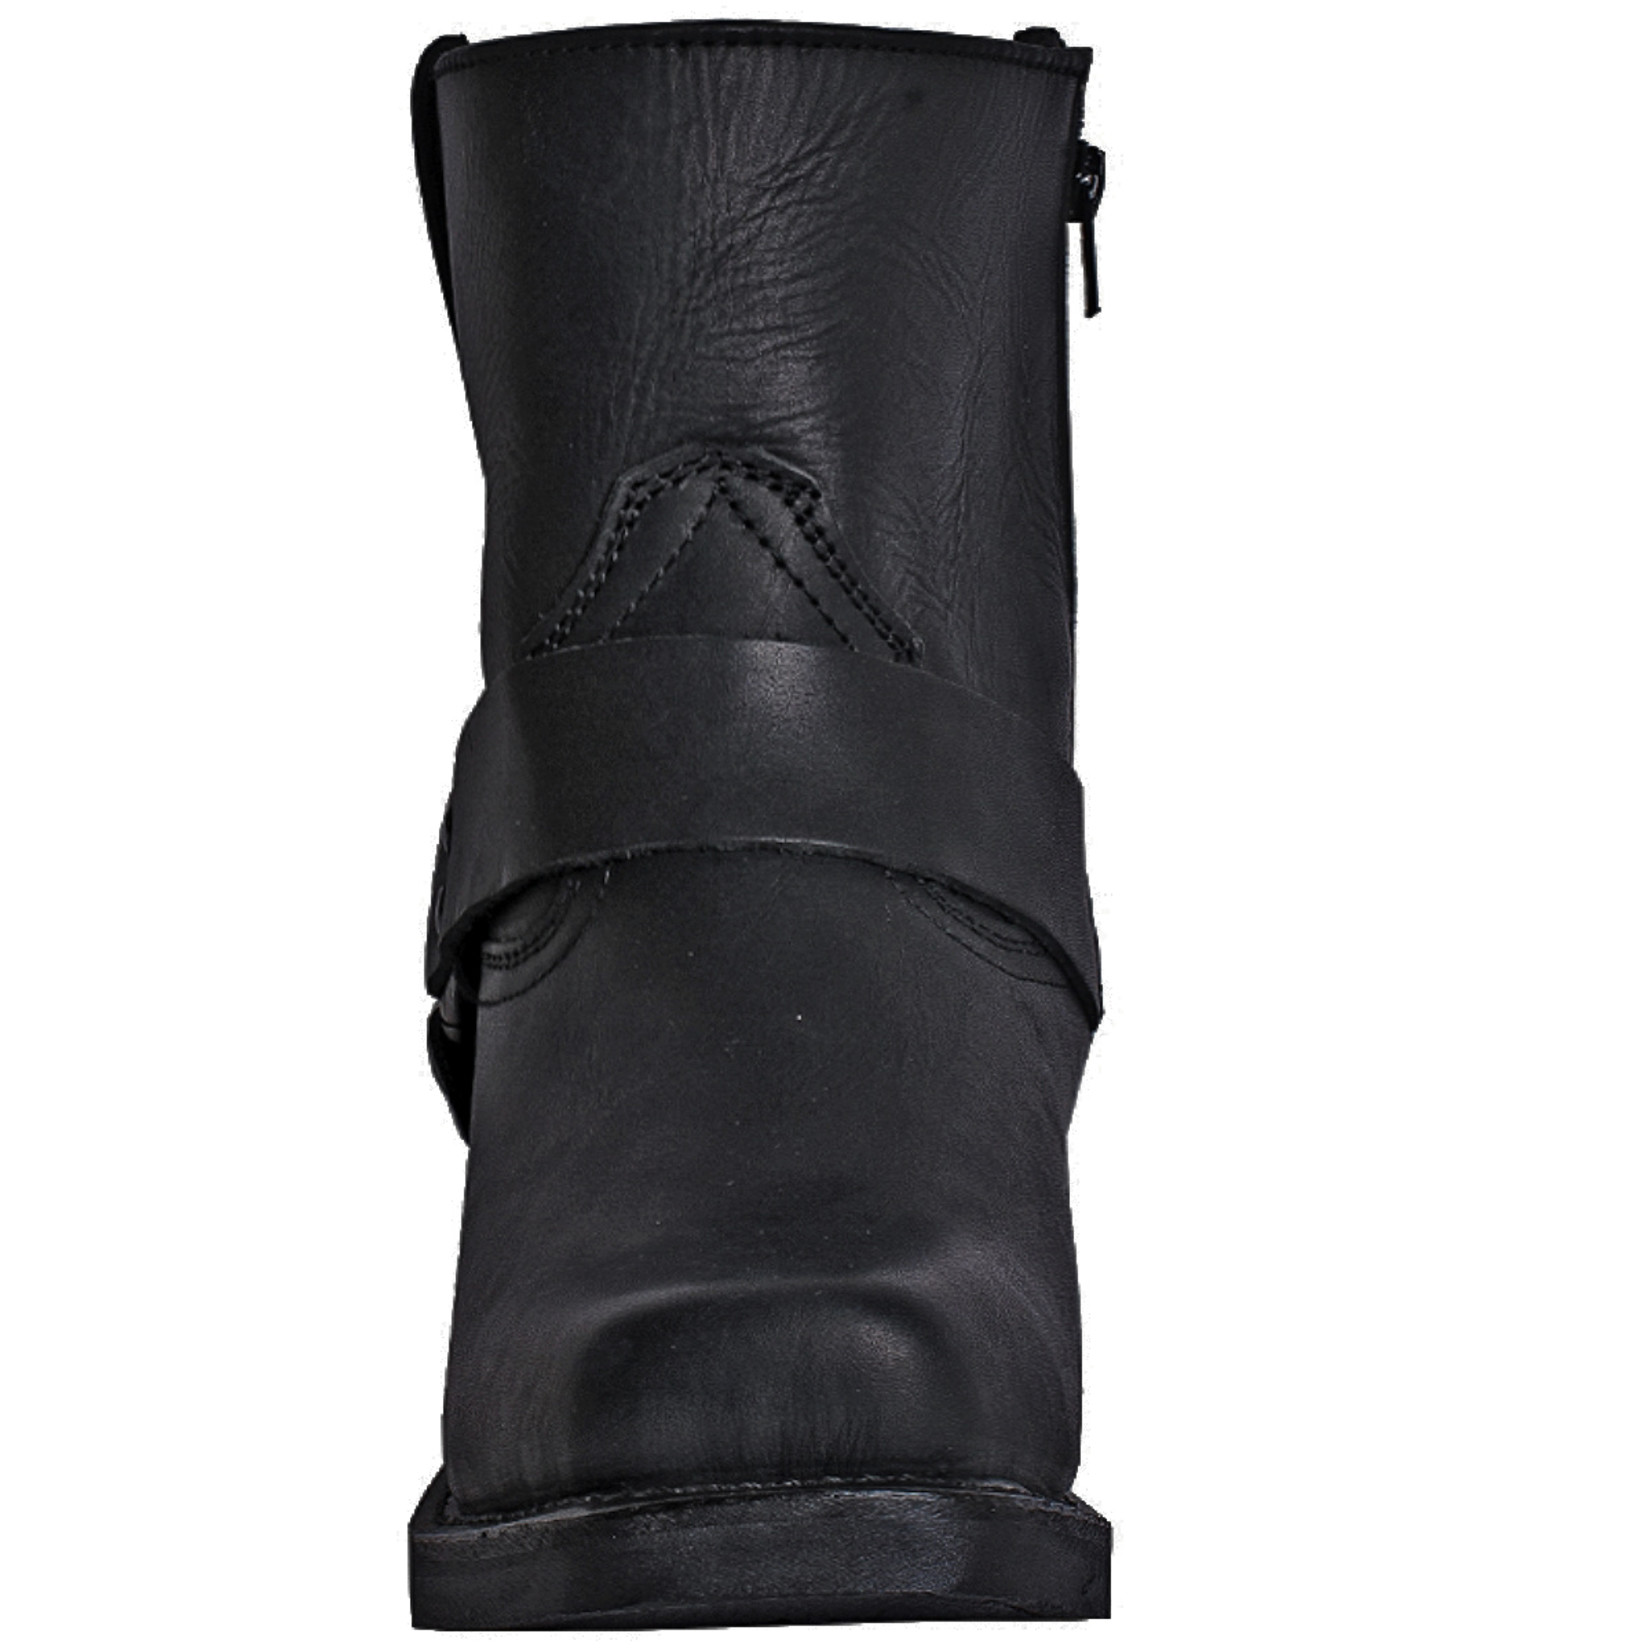 Dingo Men's Dingo Leather Harness Boot DI19090